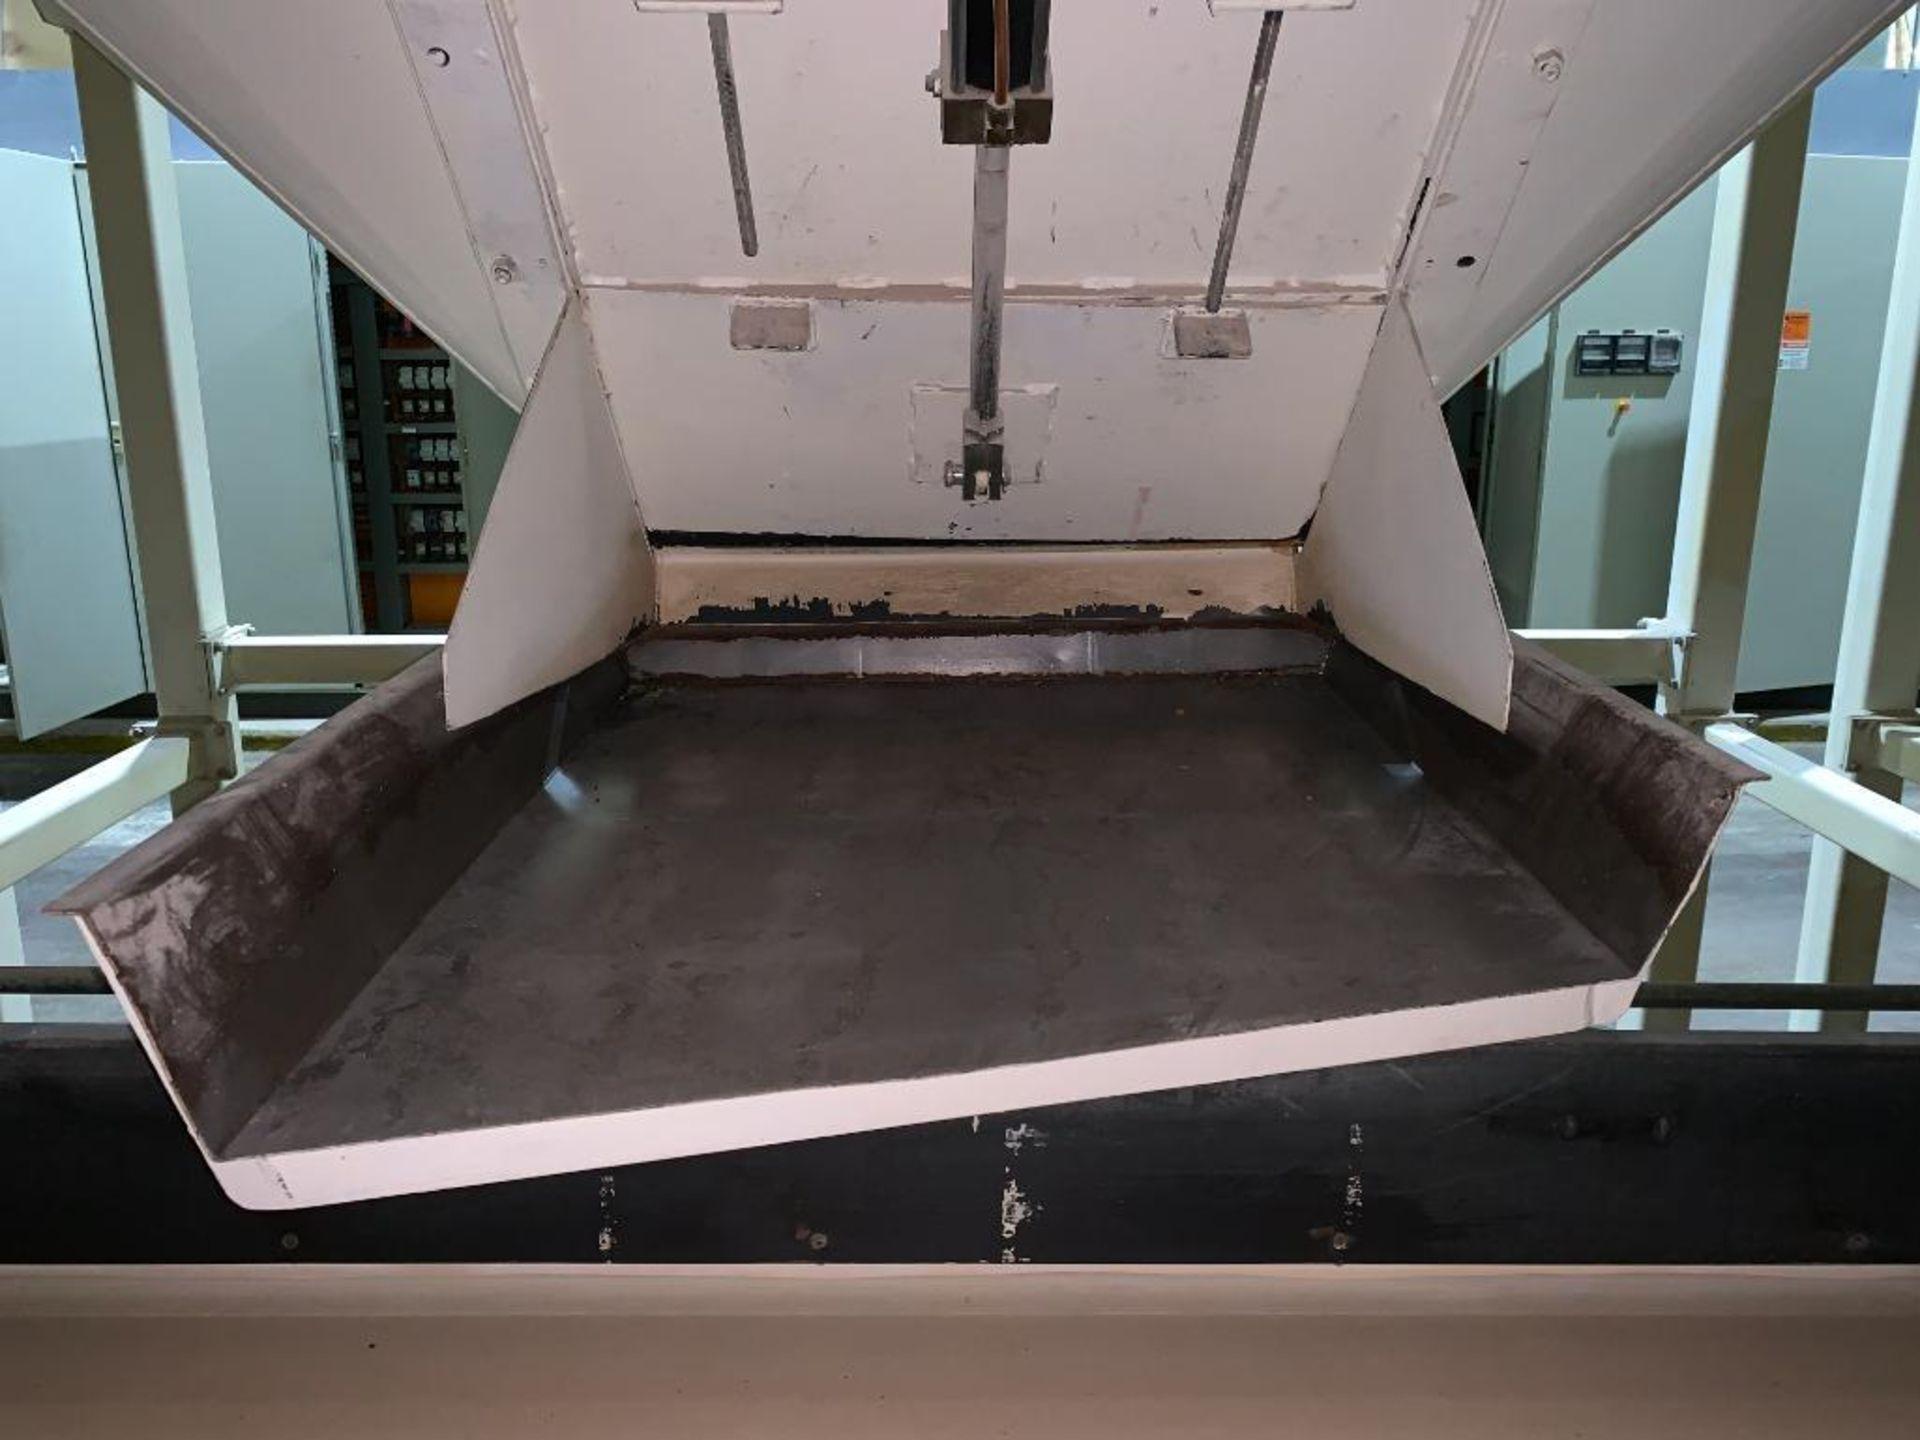 Aseeco mild steel cone bottom bulk storage bin - Image 15 of 23